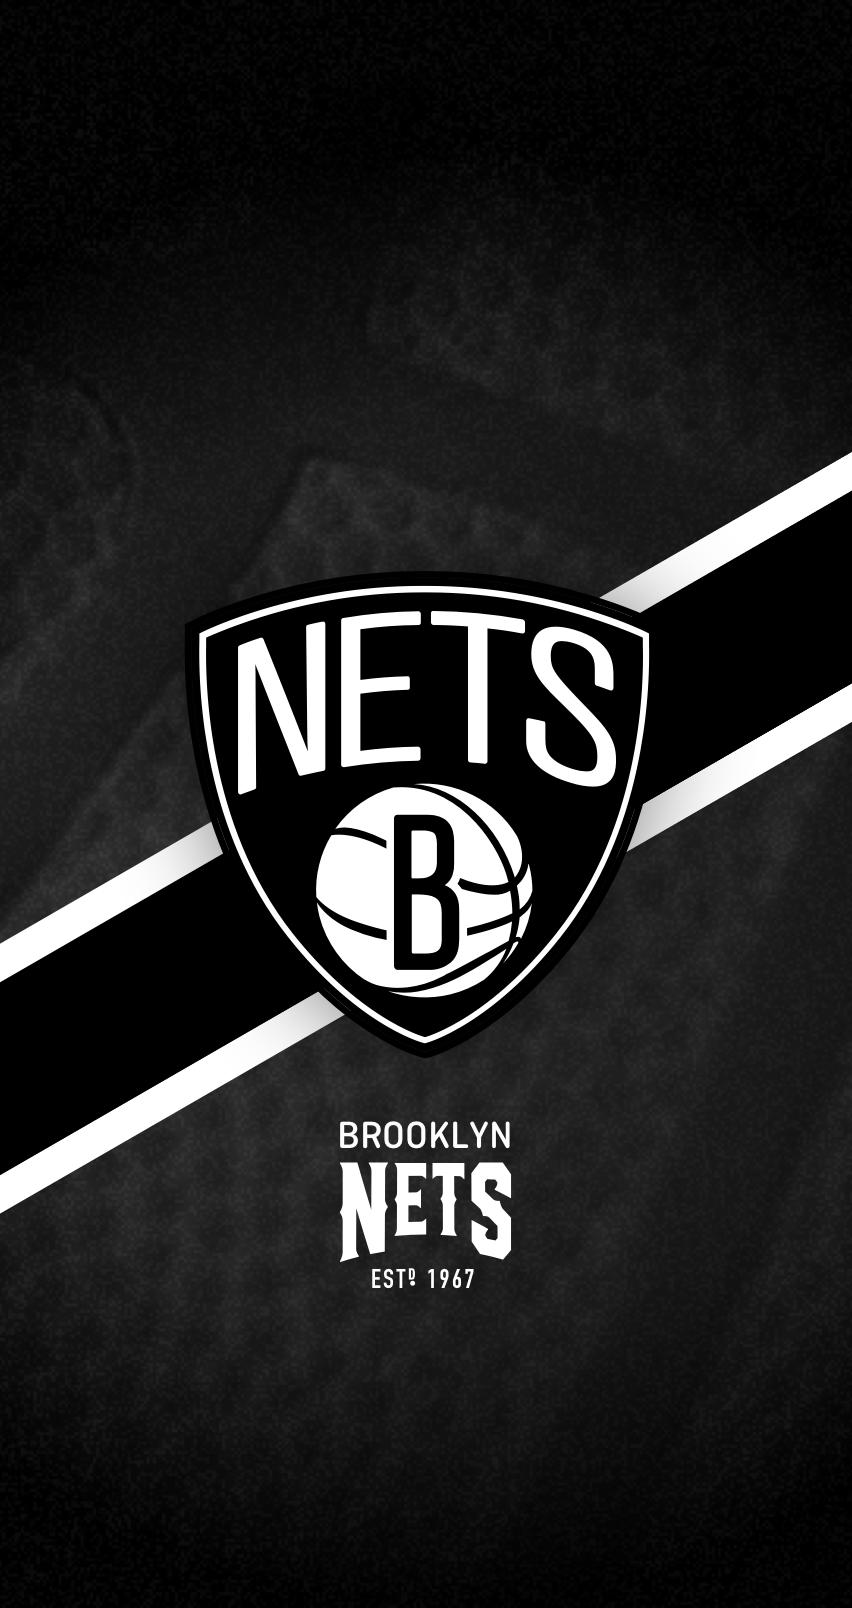 Brooklyn Nets Nba Iphone 6 7 8 Lock Screen Wallpaper Brooklyn Nets Nba Brooklyn